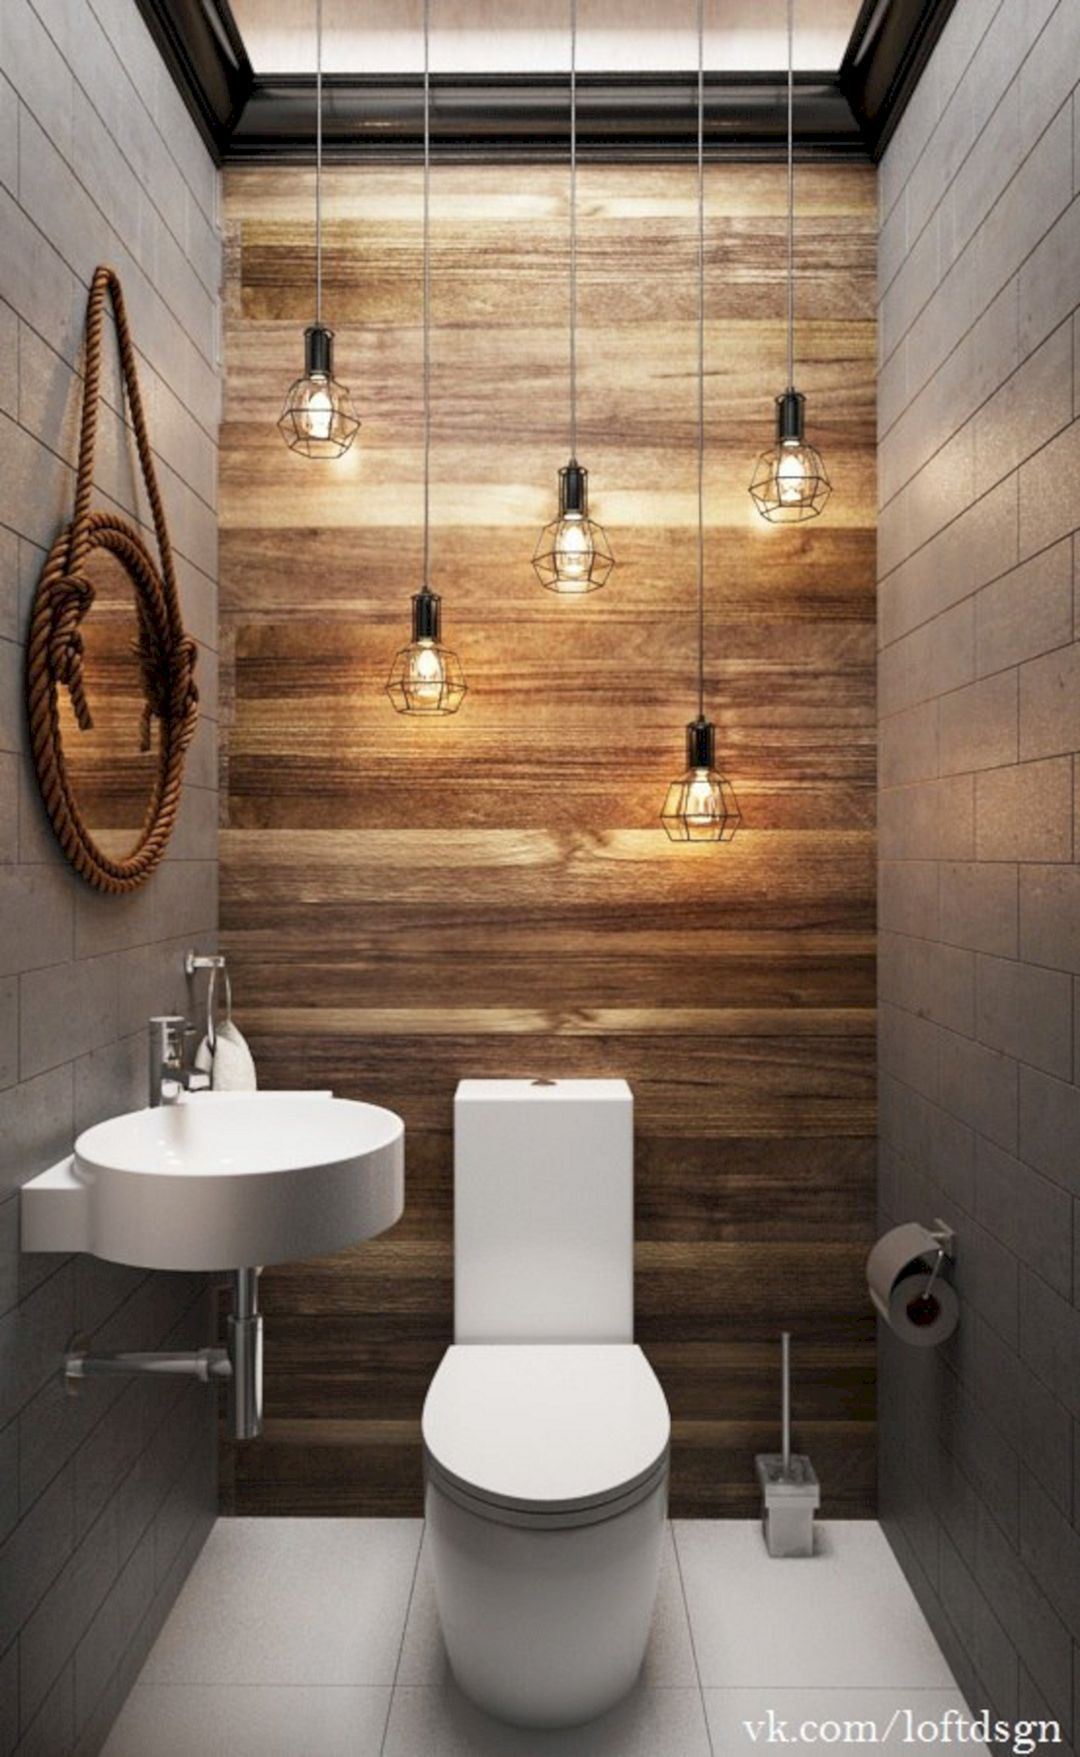 115 Extraordinary Small Bathroom Designs For Small Space 0104 Goodsgn Designbathroom Diyhom Modern Farmhouse Bathroom Bathroom Design Small Wooden Bathroom